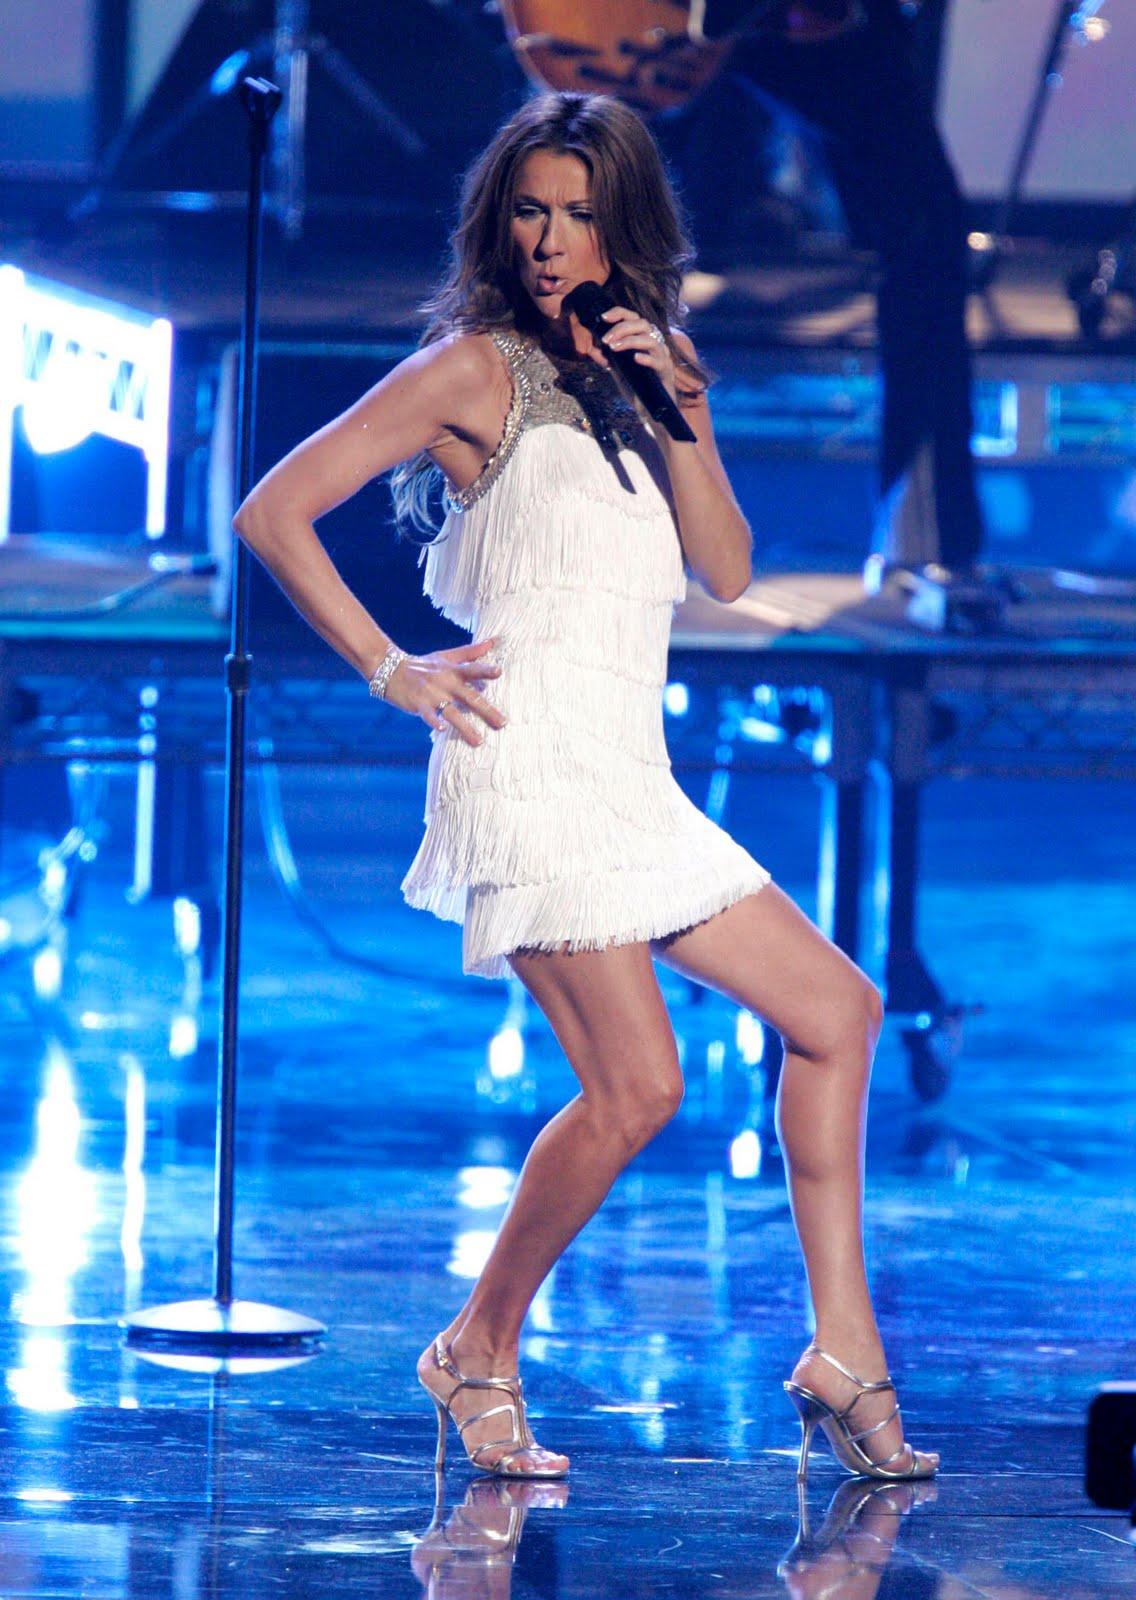 Her Calves Muscle Legs: Celine Dion`s calves